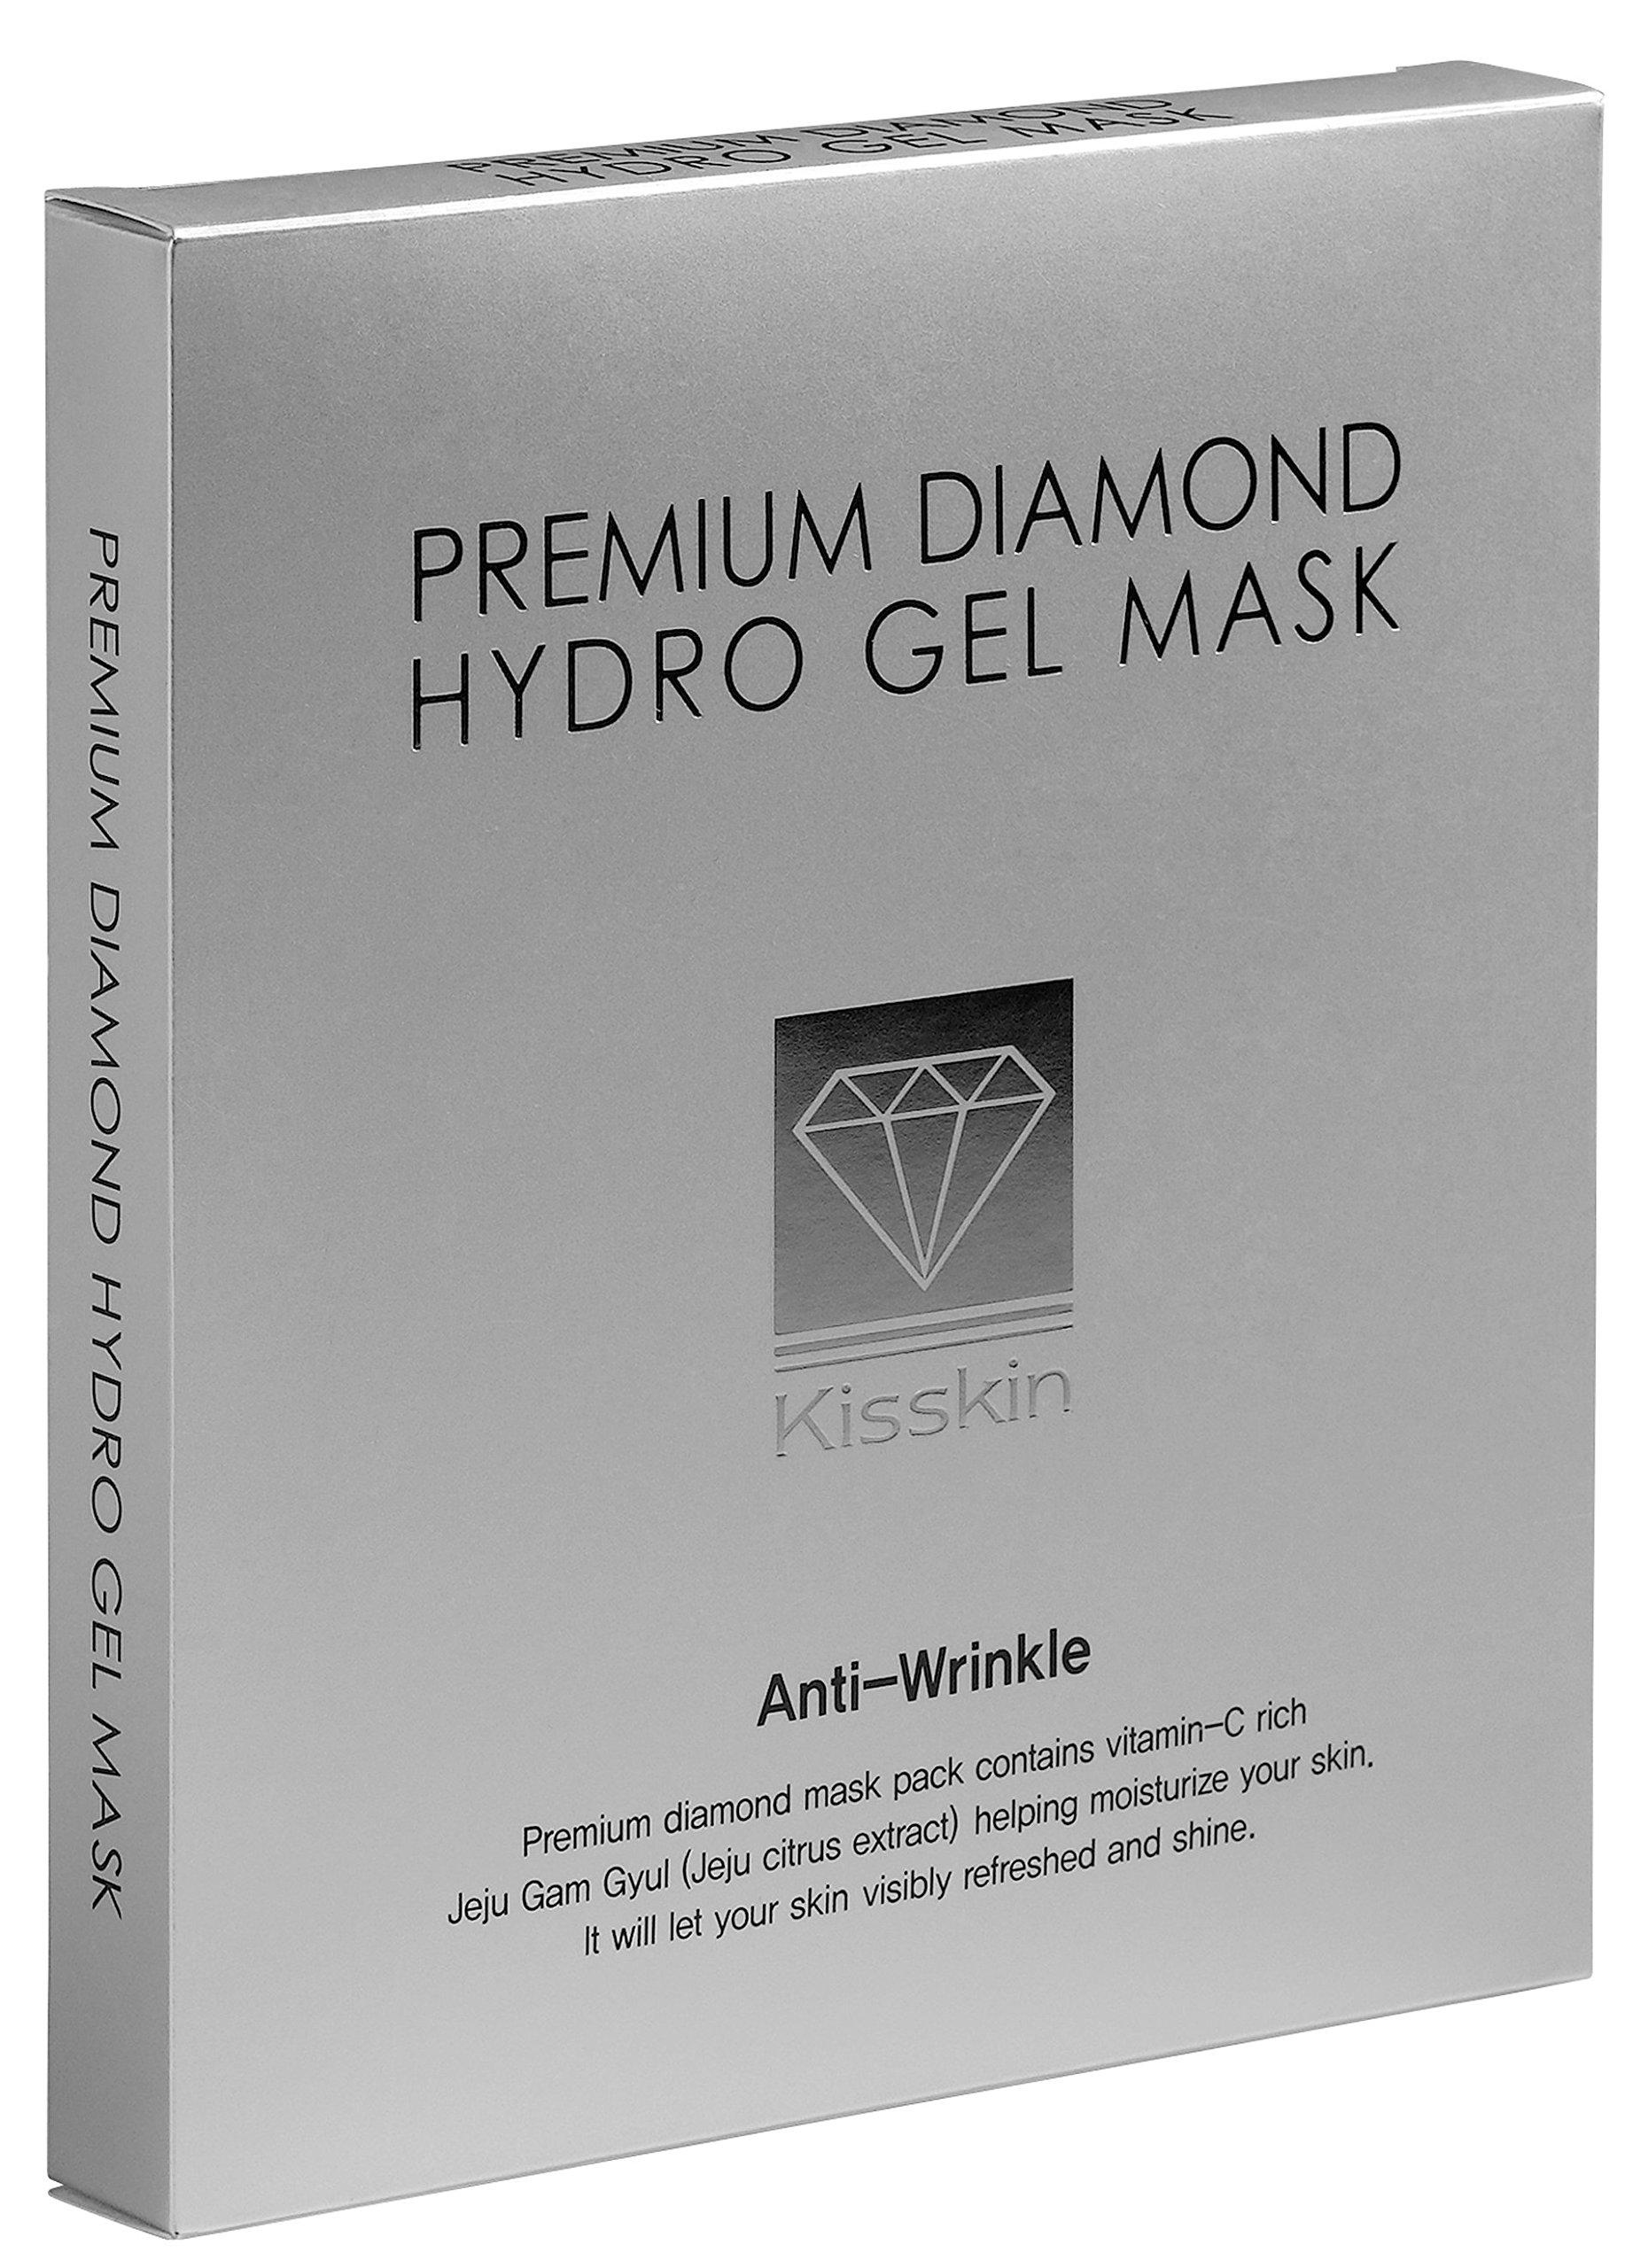 Facelift Plant Stem Cell Anti Aging Facial Mask With Secret Key Nature Recipe Pack Tea Tree 20g 3pcs Kisskin Korean Face